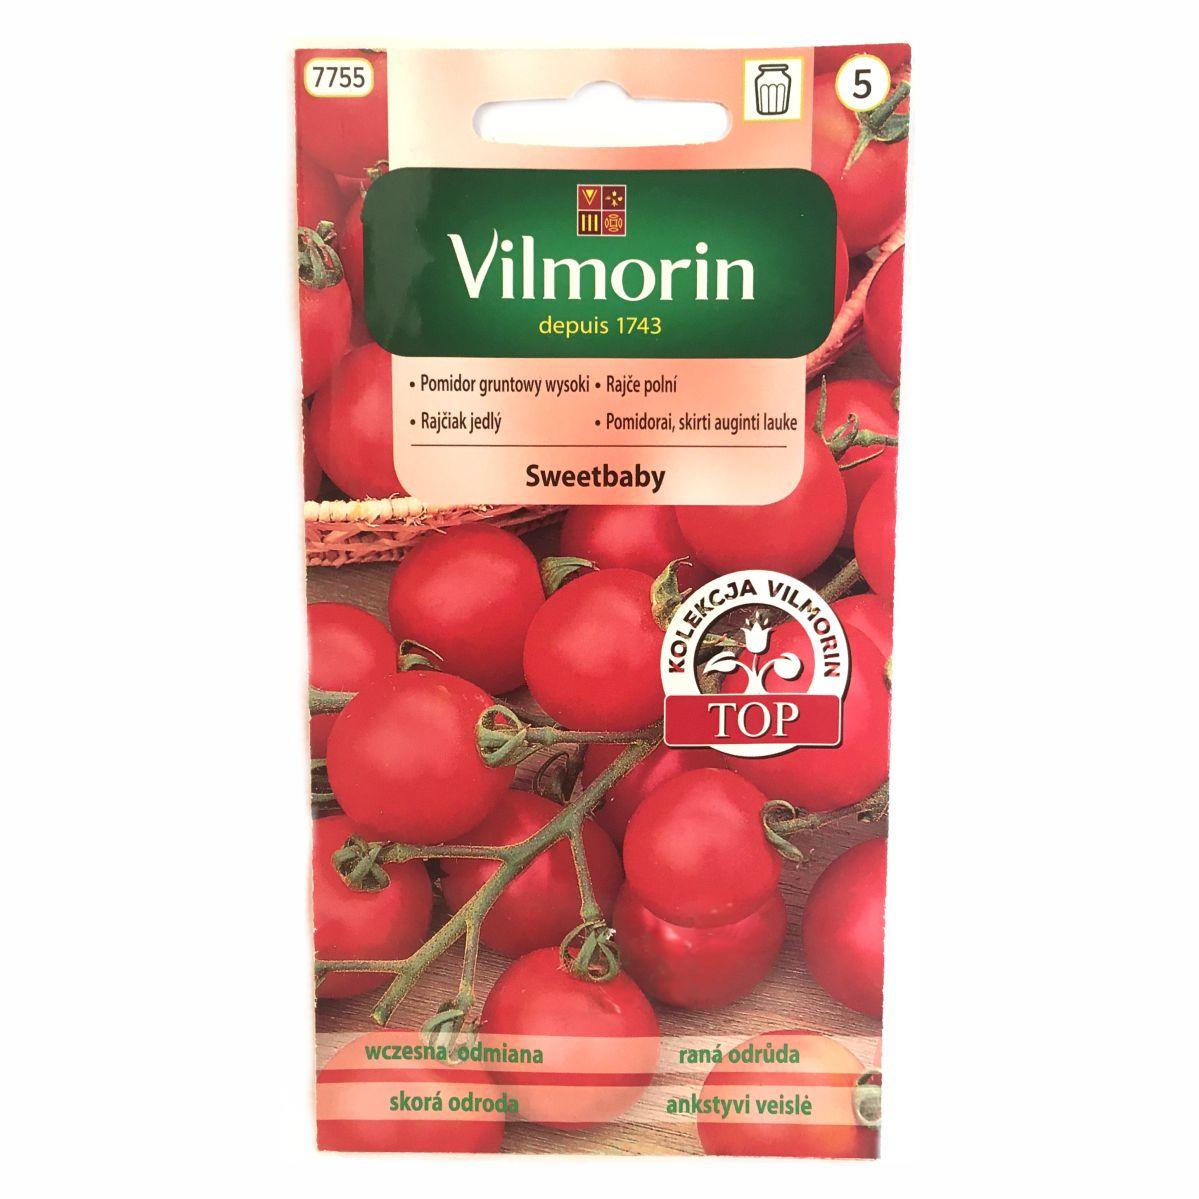 Pomidor Sweetbaby nasiona Vilmorin